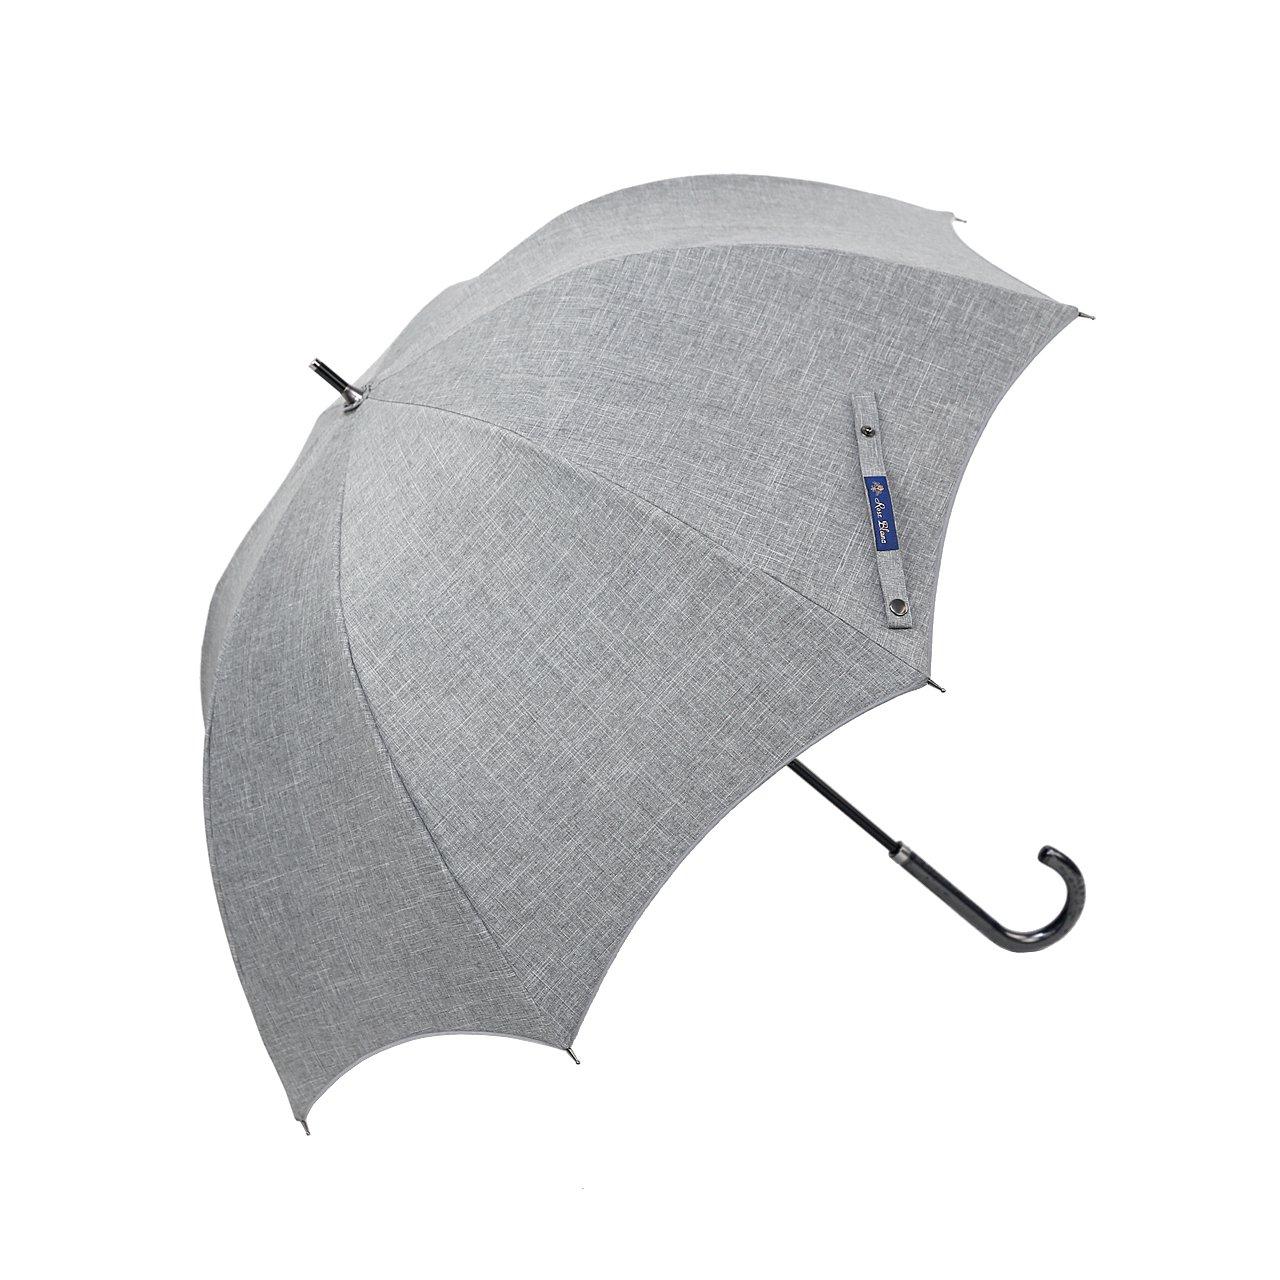 【Rose Blanc】100%完全遮光 日傘 プレーン ラージサイズ ダンガリー 60cm 15 (ダンガリーグレー) B0141VUSM8ダンガリーグレー